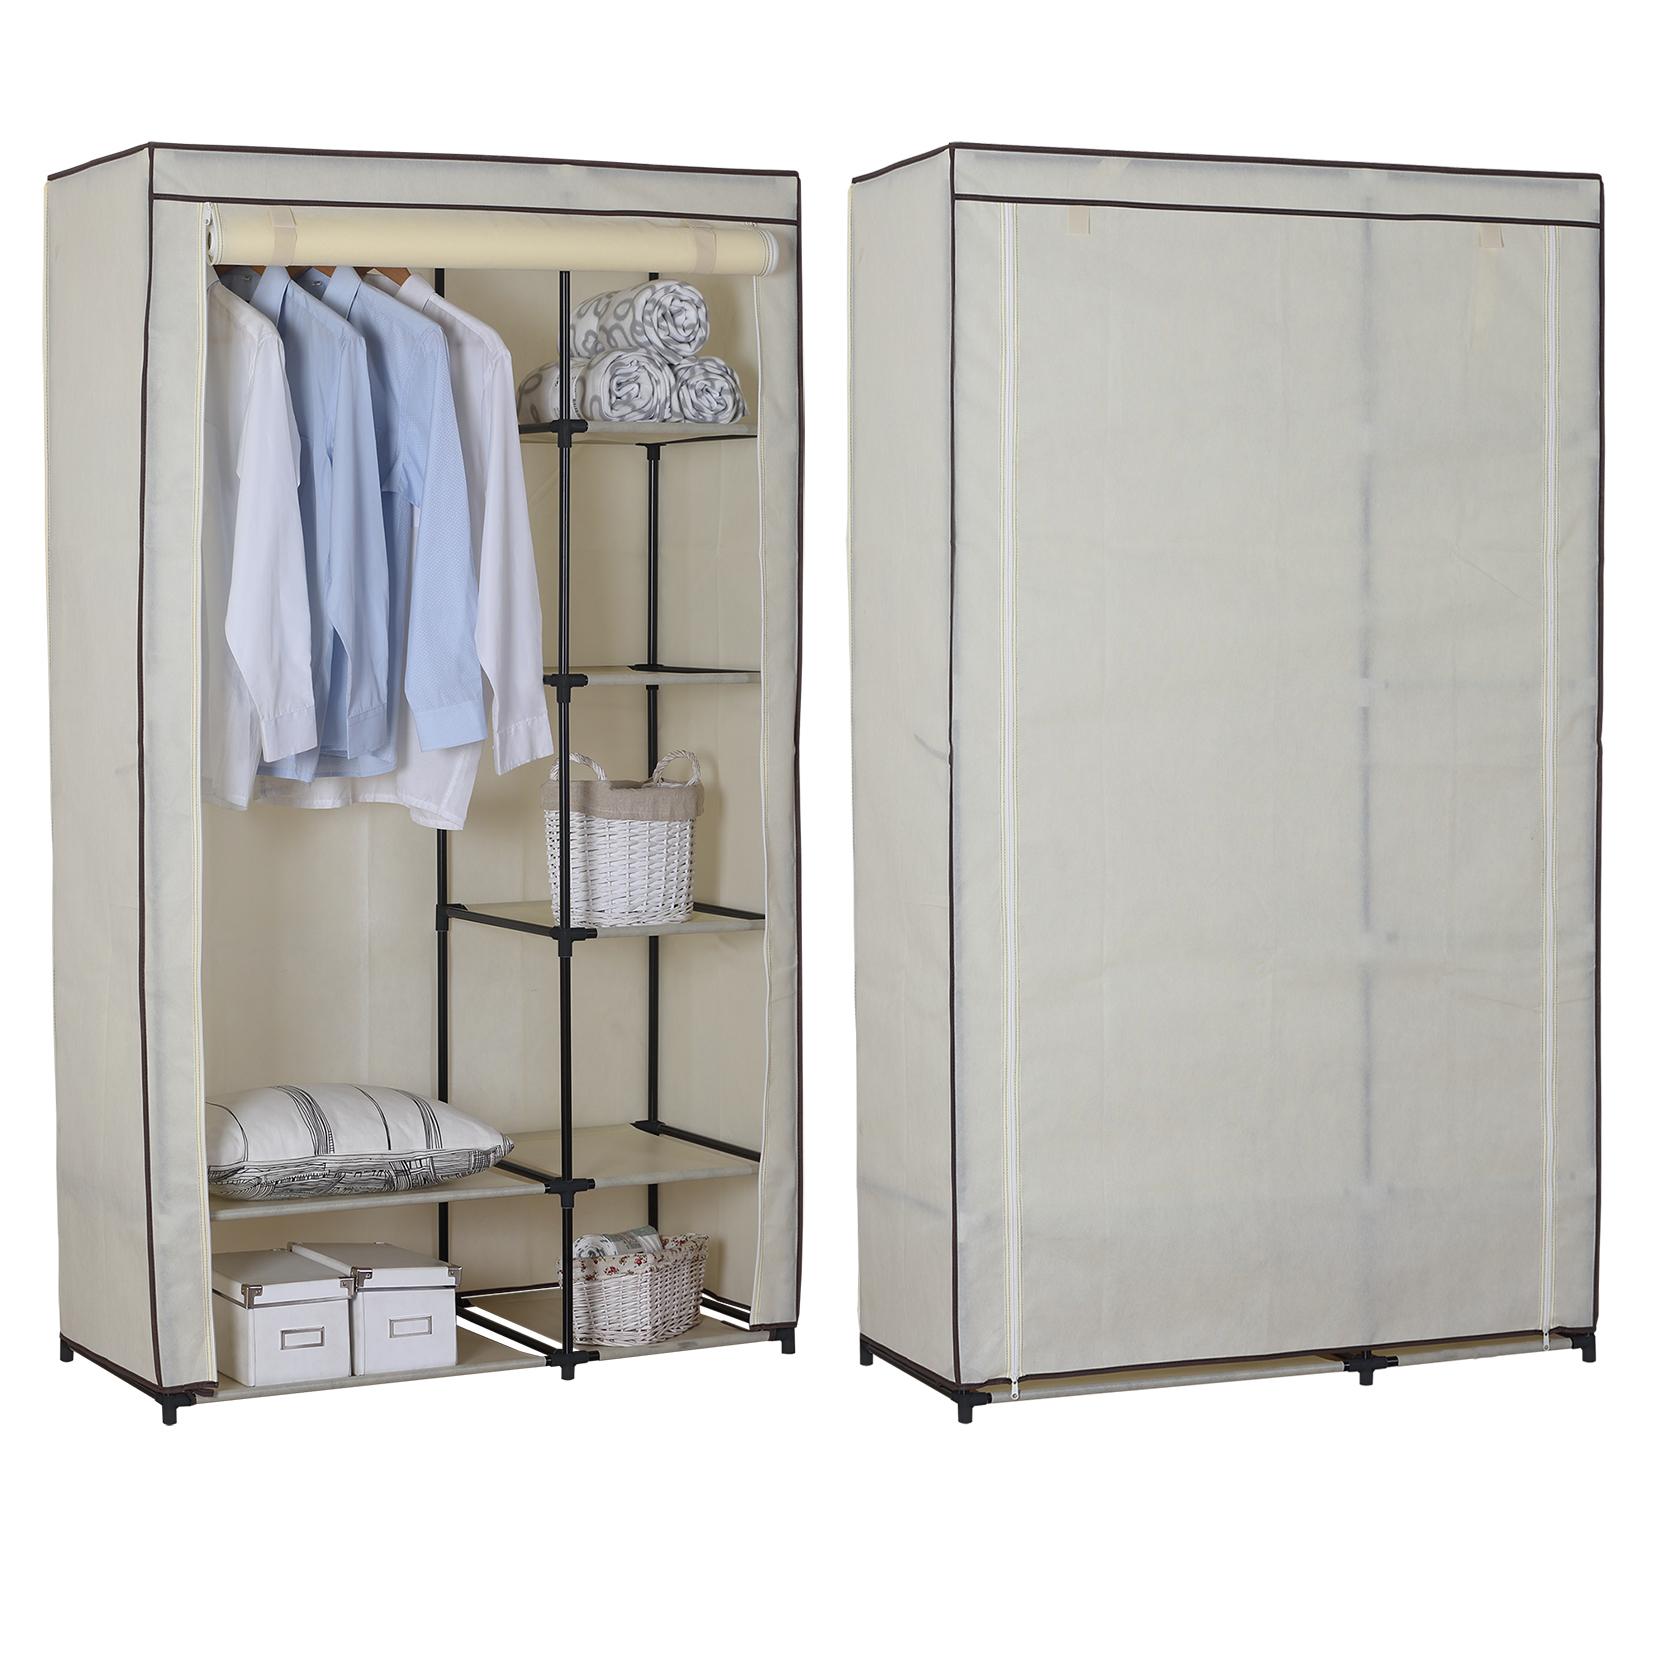 kleiderschrank garderobenschrank campingschrank faltschrank stoff creme ss5026cm ebay. Black Bedroom Furniture Sets. Home Design Ideas